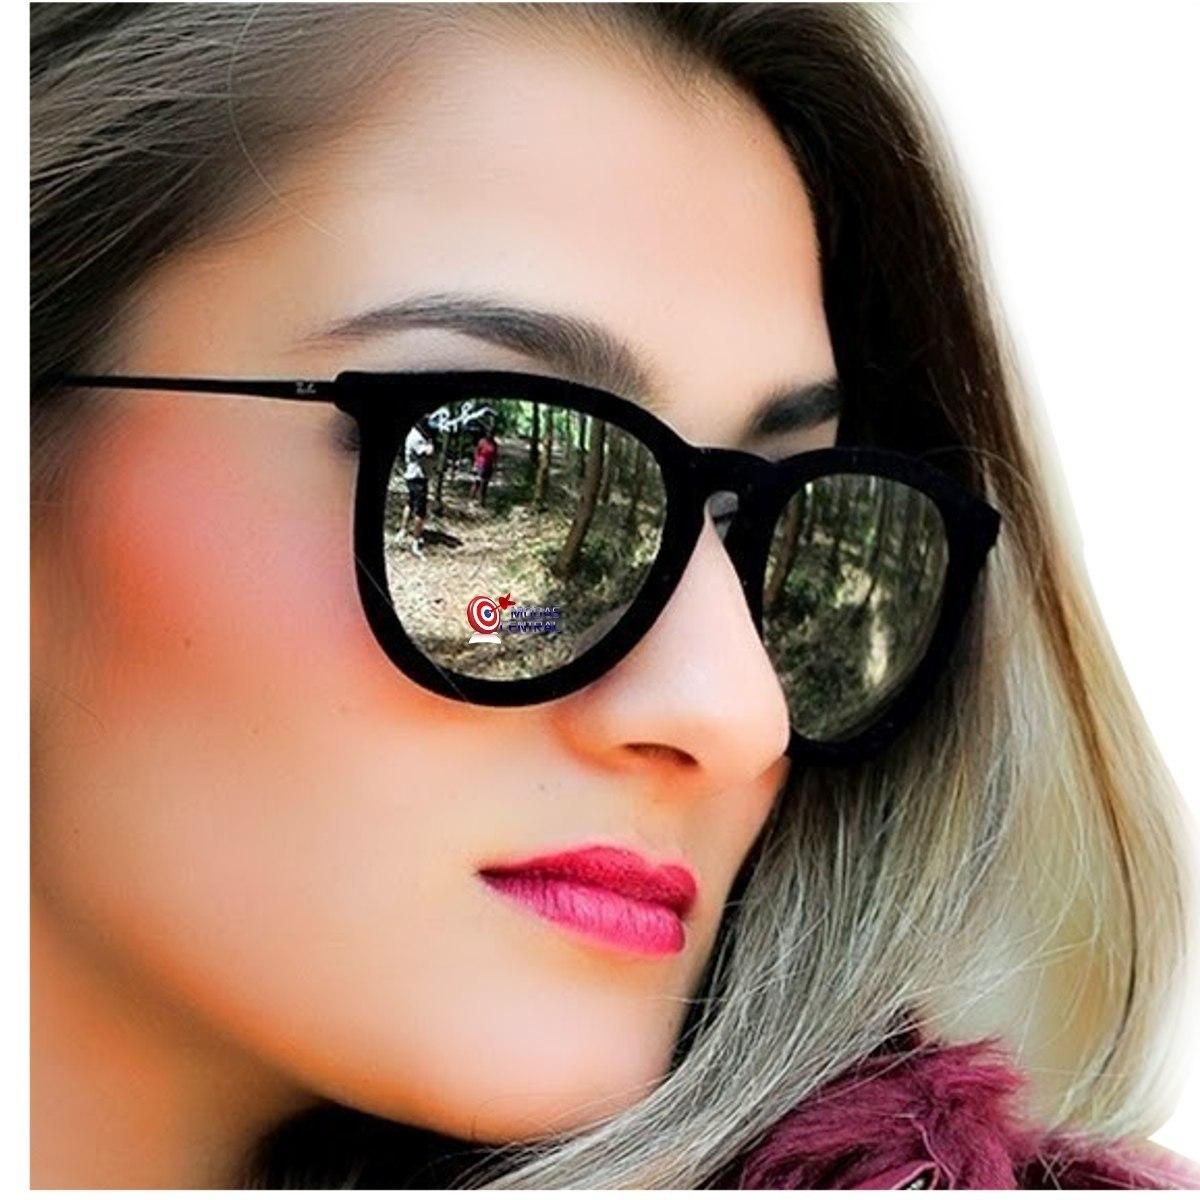 703222fb864b6 Mercado Livre Oculos Ray Ban Feminino – Southern California Weather ...